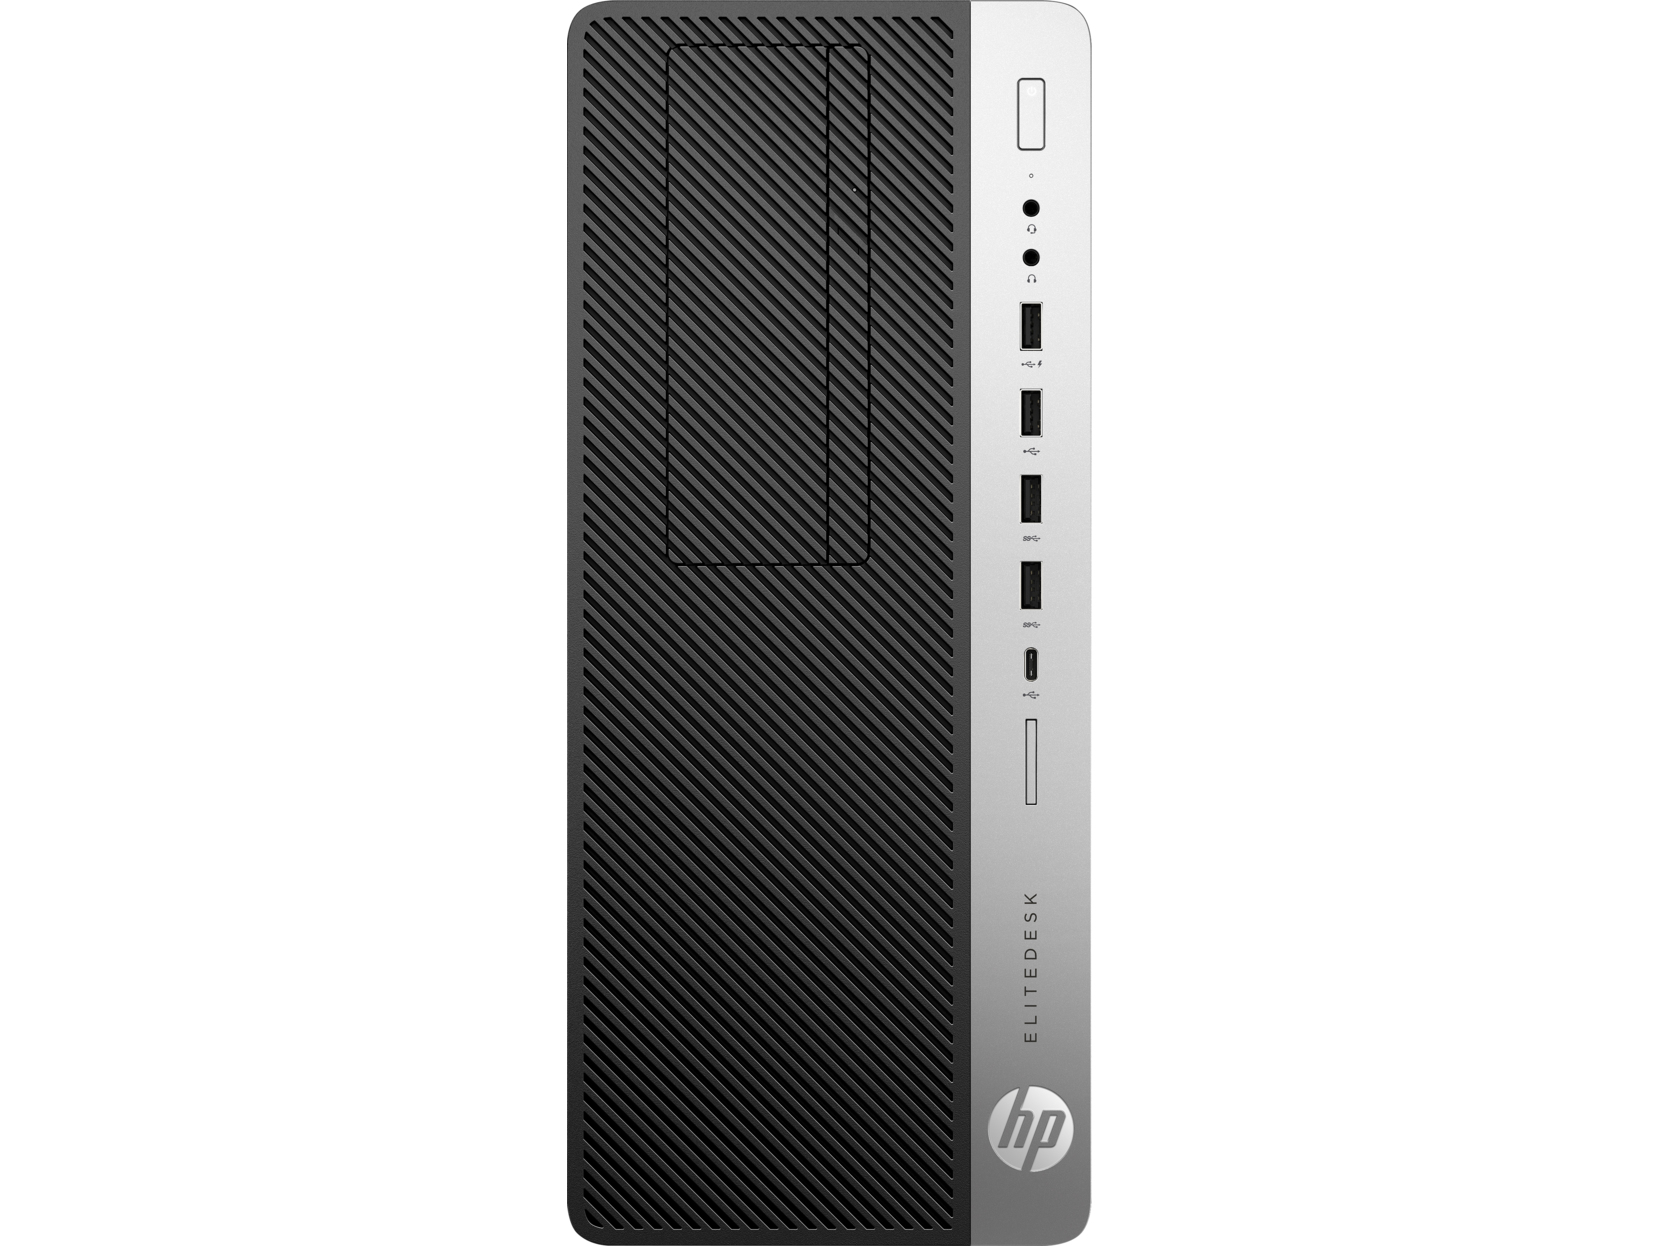 HP EliteDesk 800 G3 Tower 1FU44AW#ABU Core i5-7500 8GB 500GB DVDRW Win 10 Pro